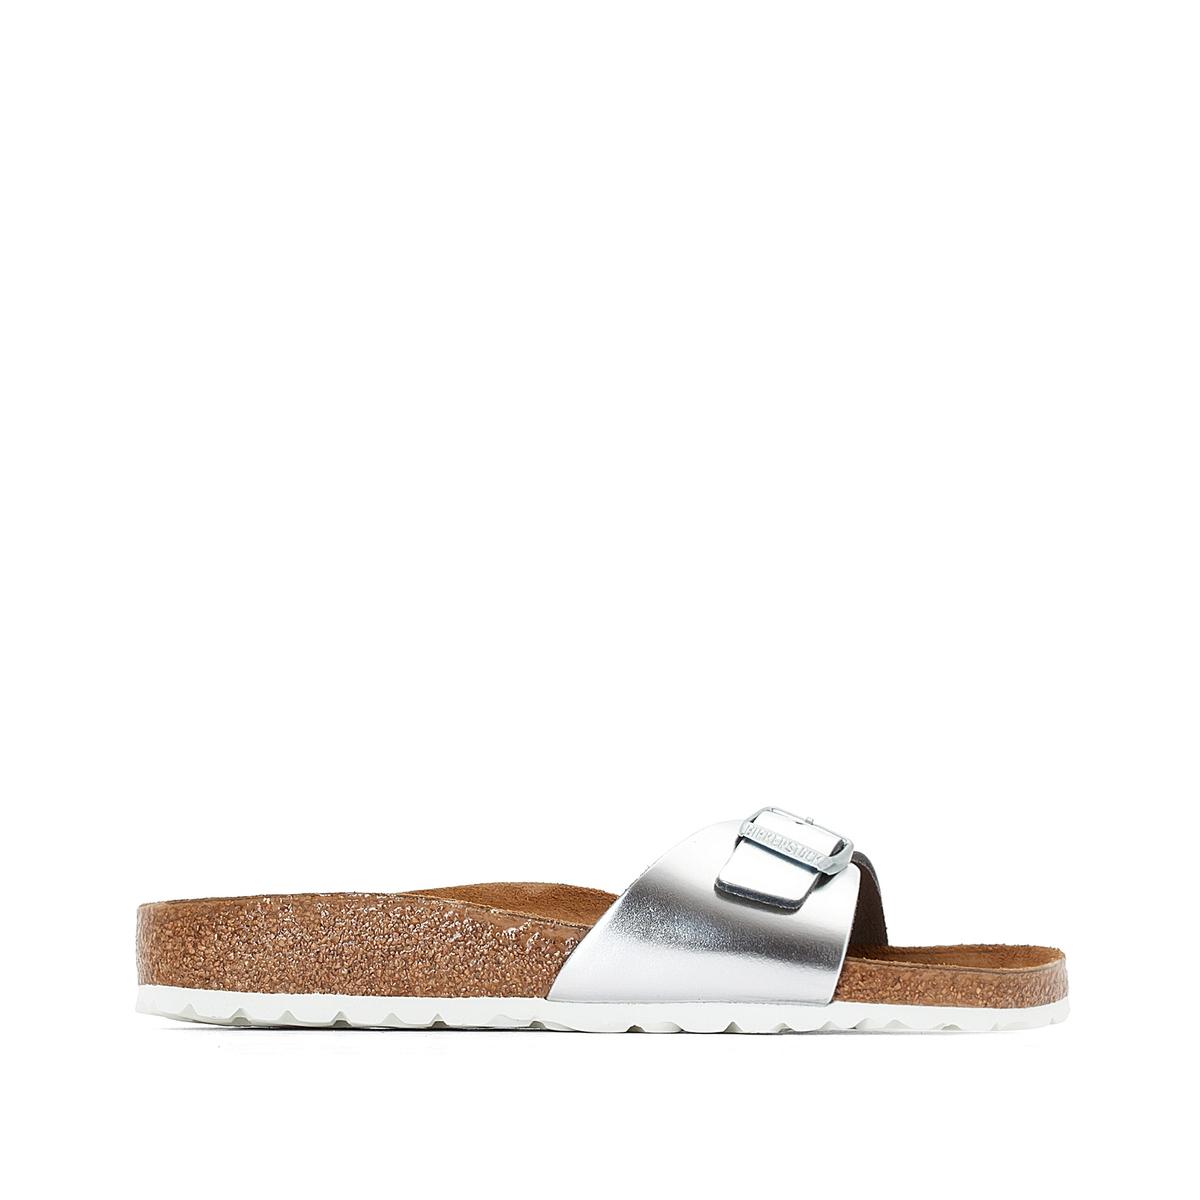 BIRKENSTOCK Туфли без задника с металлическим блеском Madrid